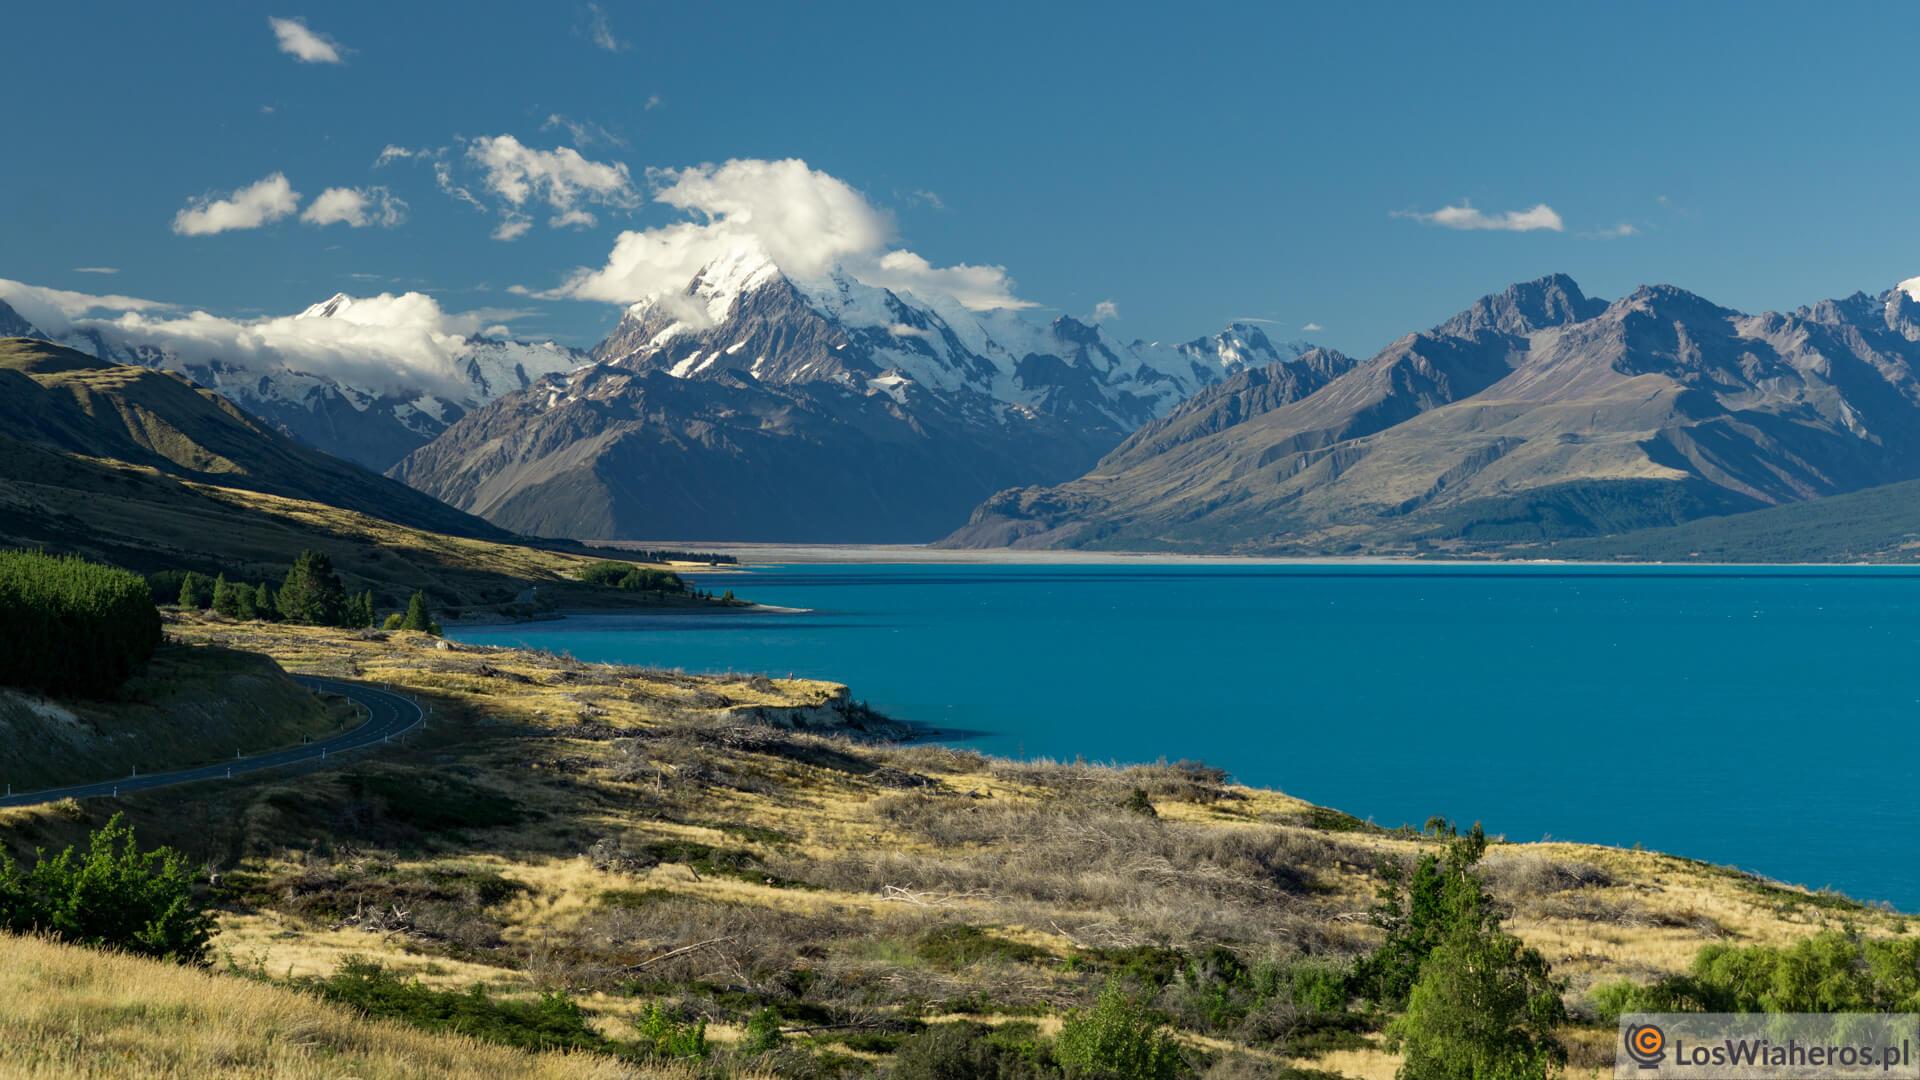 Jezioro Pukaki i Góra Cooka, Nowa Zelandia.